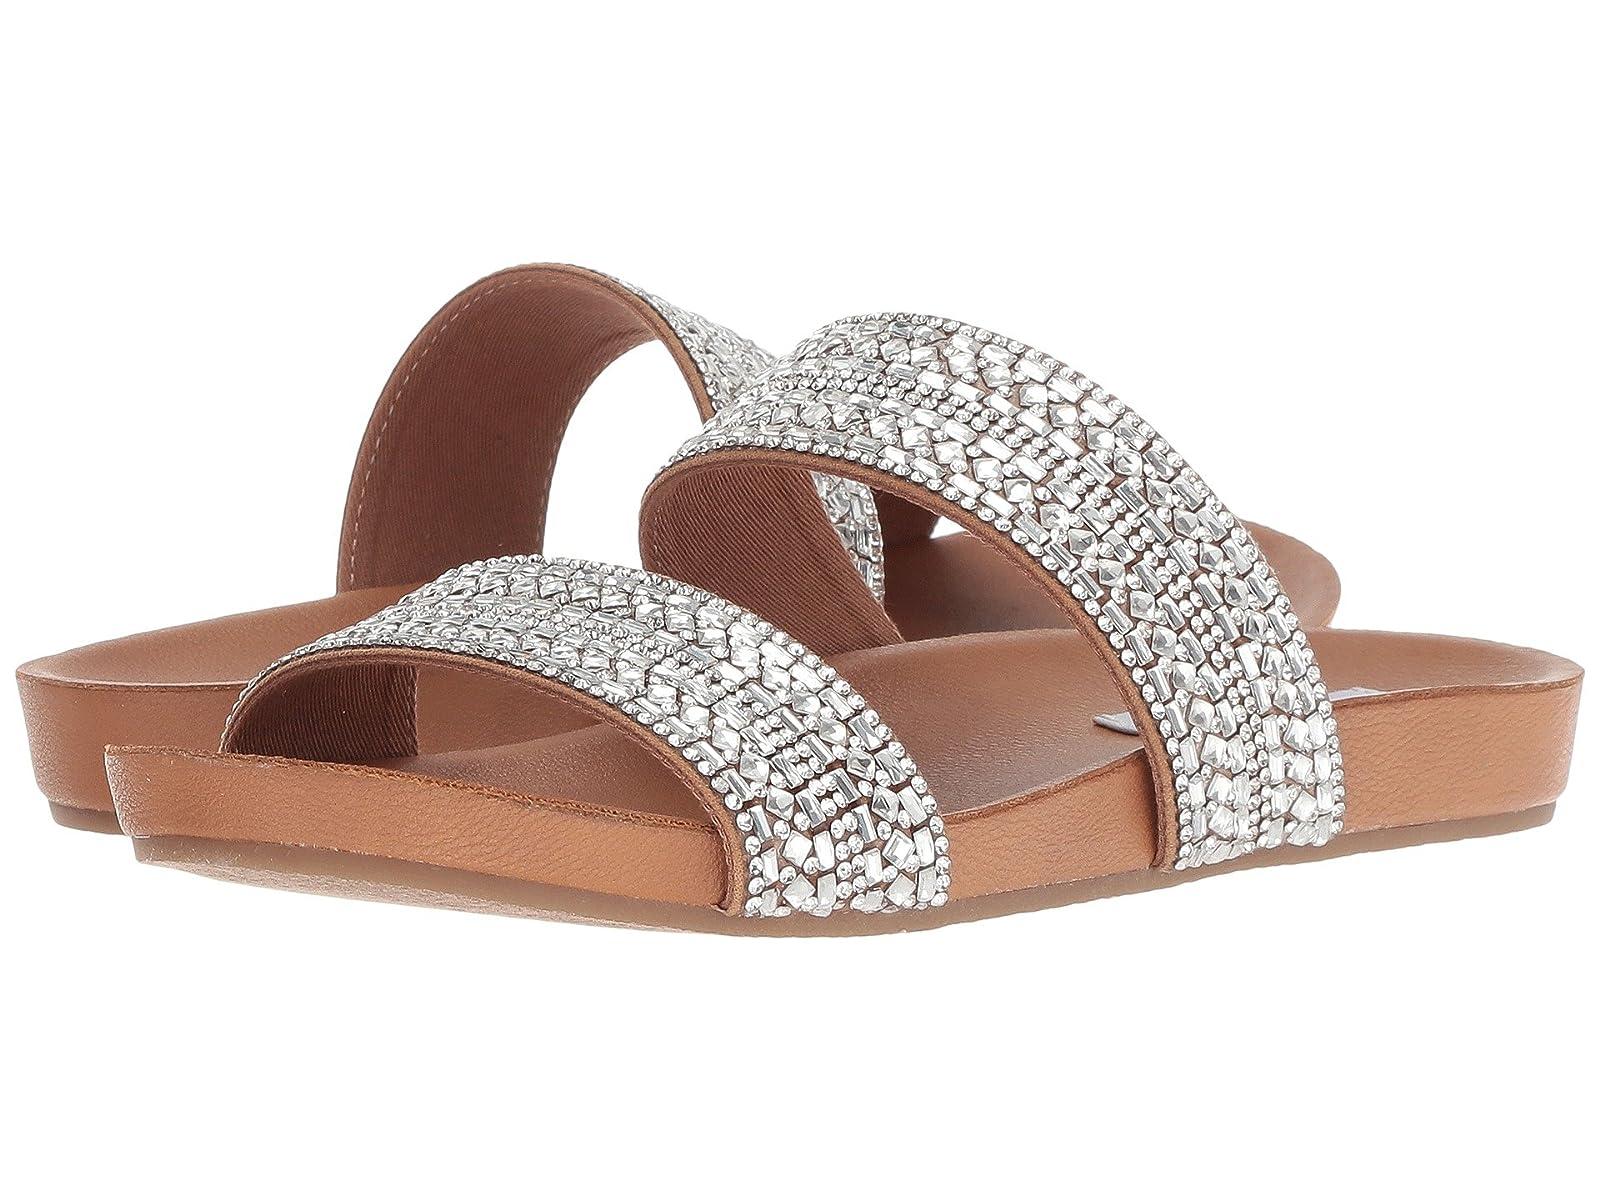 Steve Madden ShaynaCheap and distinctive eye-catching shoes